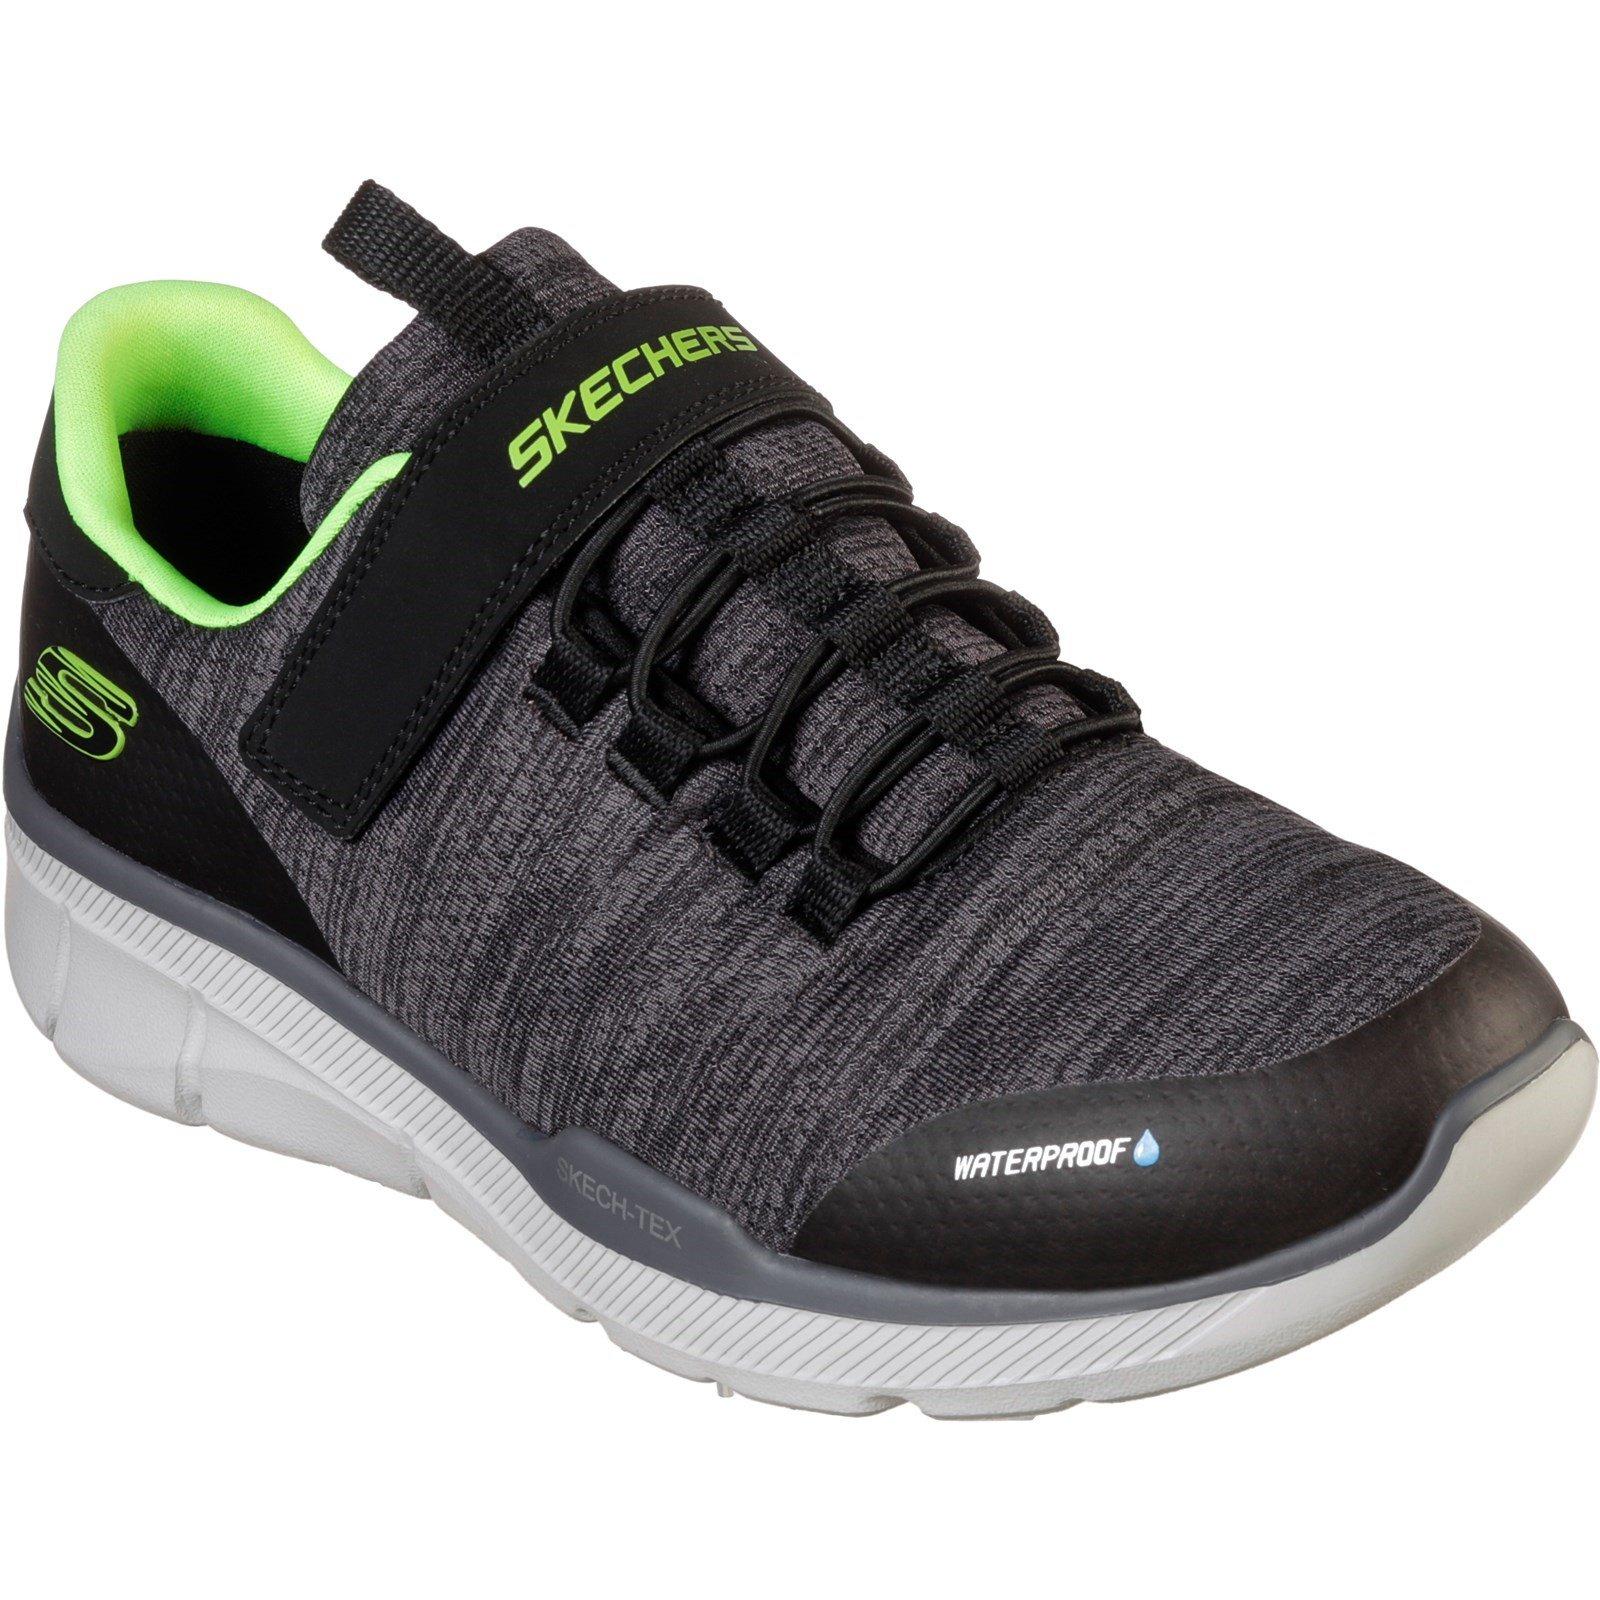 Skechers Unisex Equalizer 3.0 Aquablast Trainer Black 28533 - Black/Charcoal 13